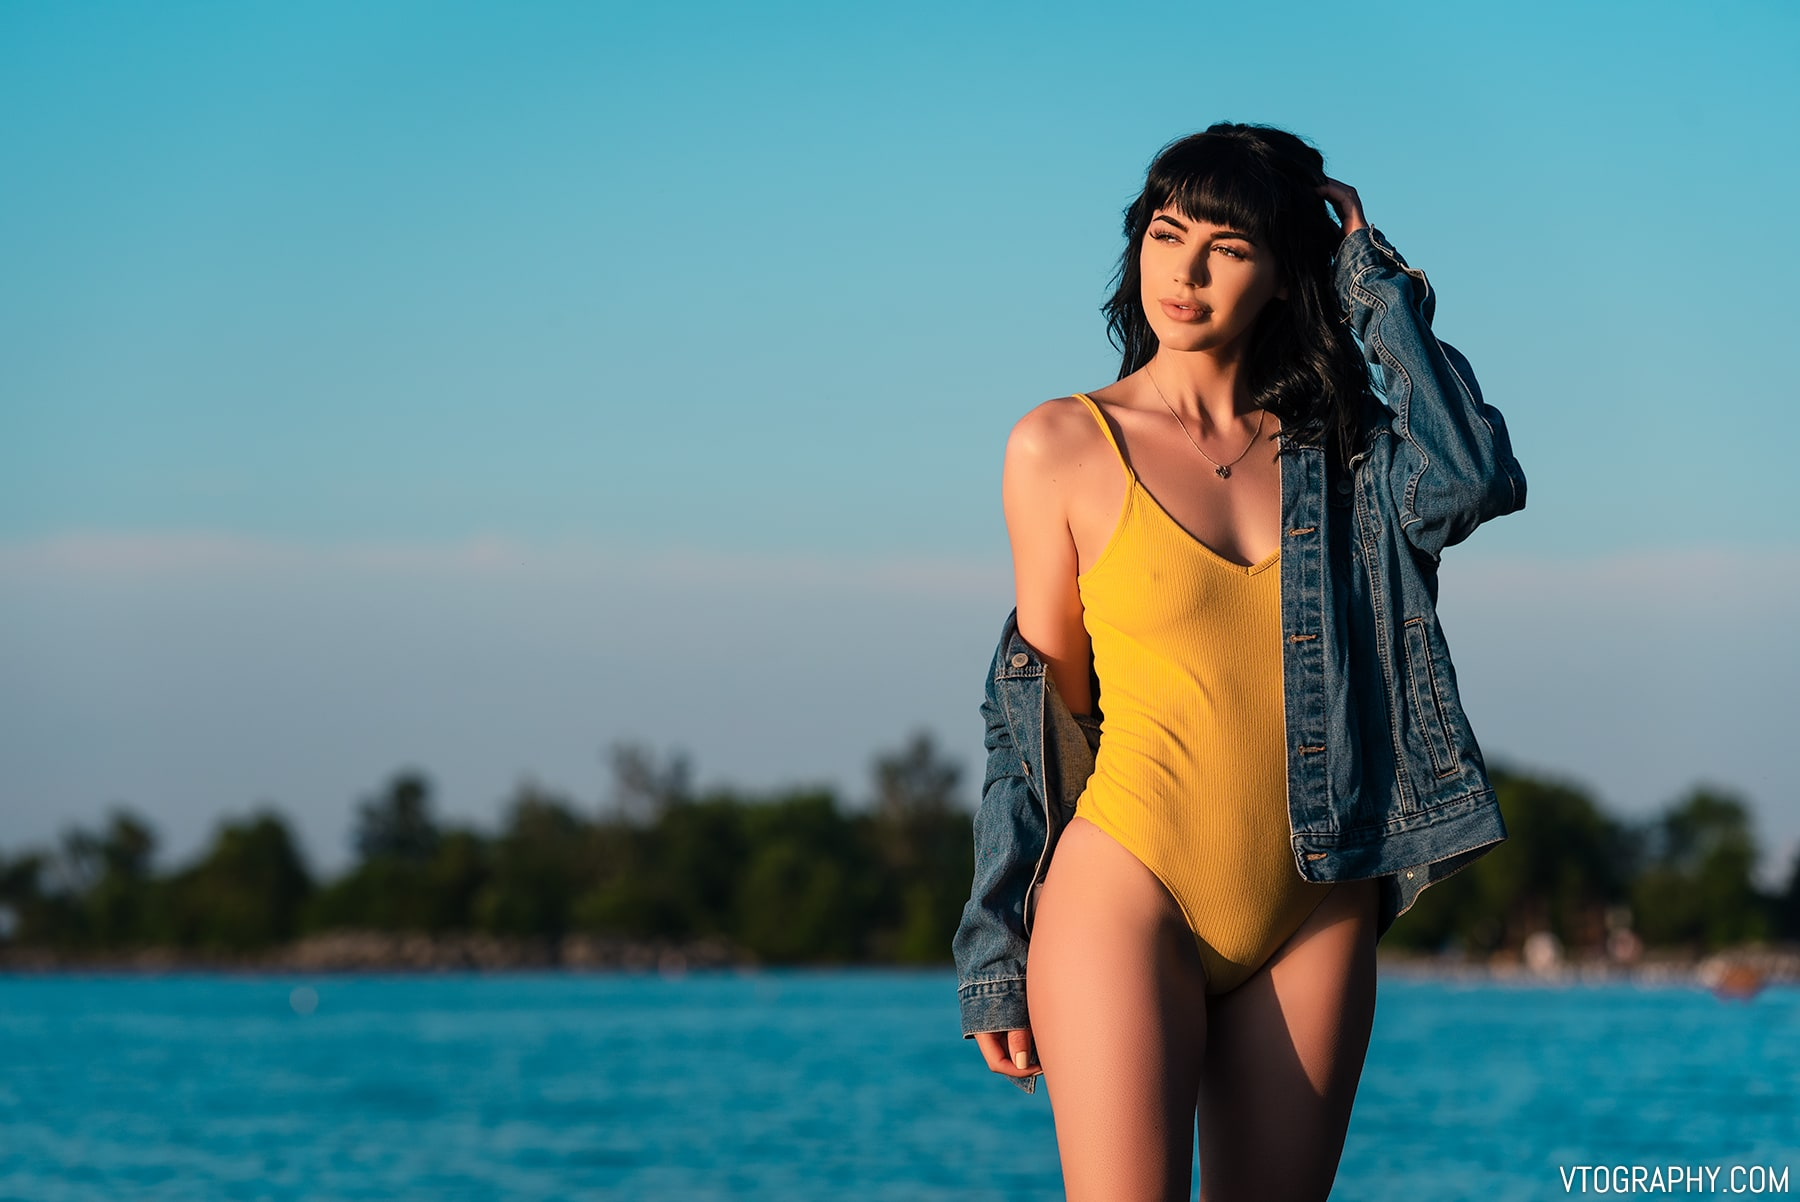 Model in yellow bodysuit and denim jacket